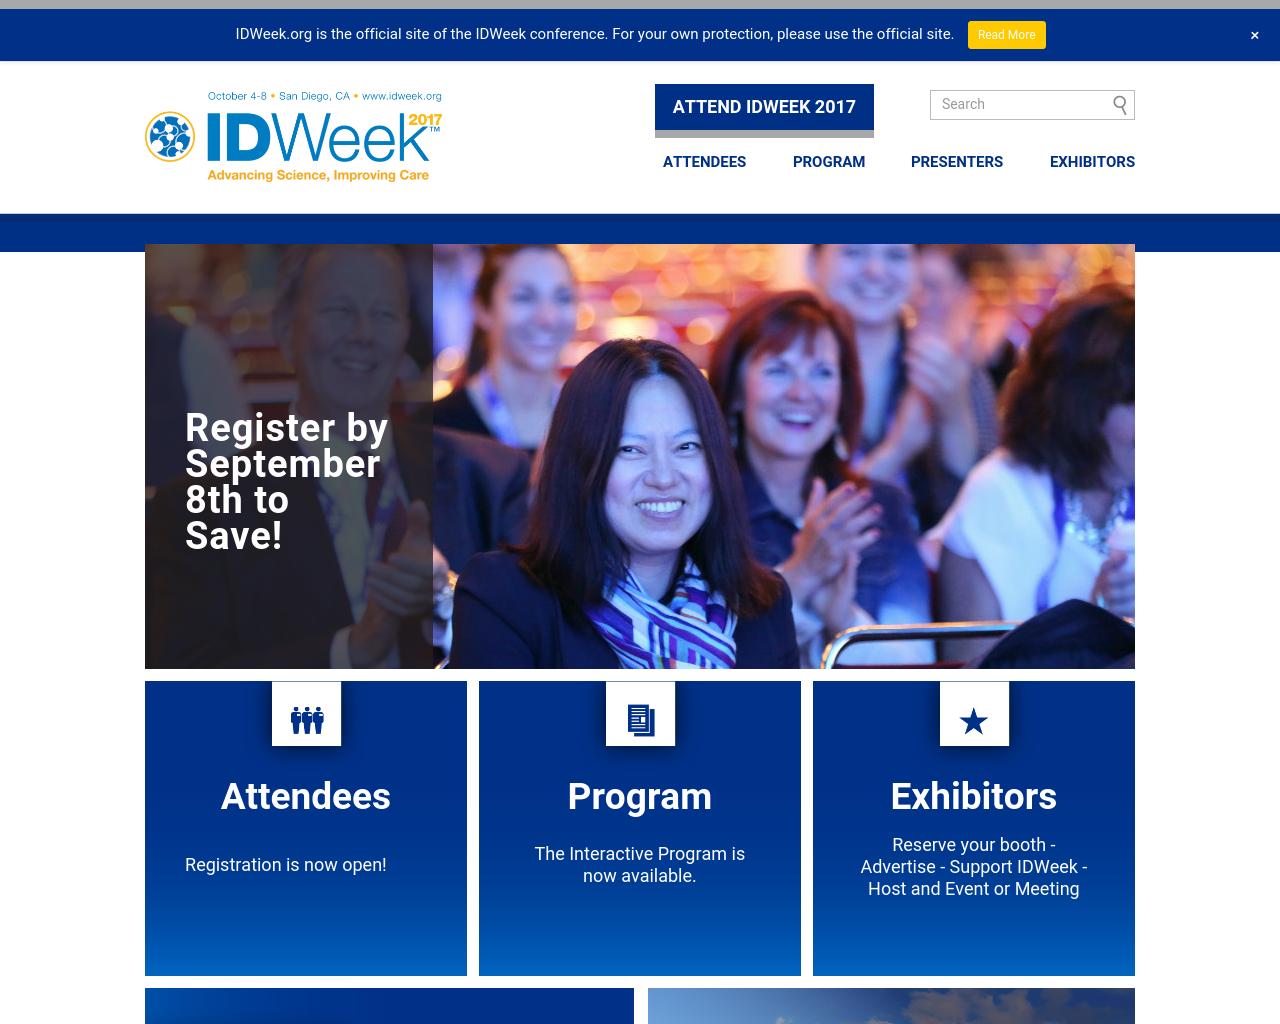 idweek.org-Advertising-Reviews-Pricing